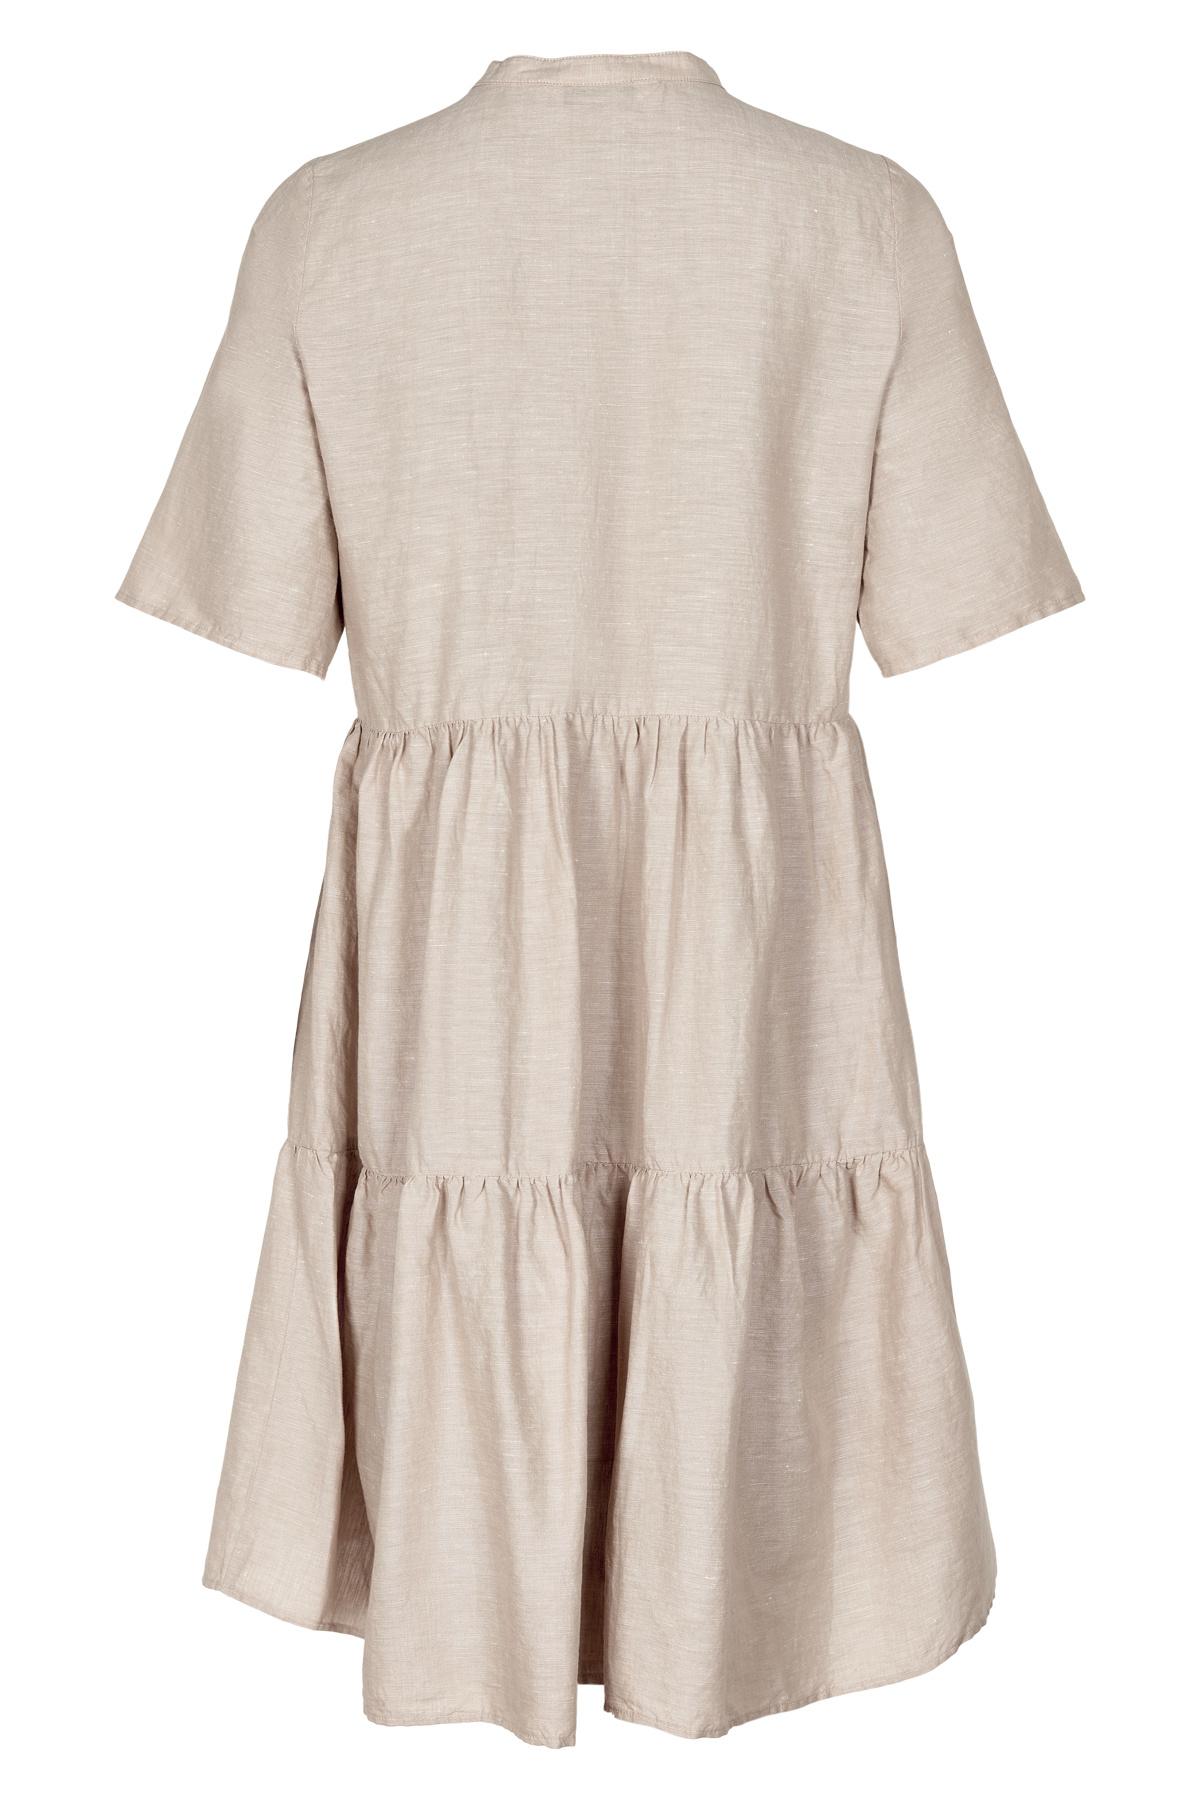 AndLess Pane SS Dress